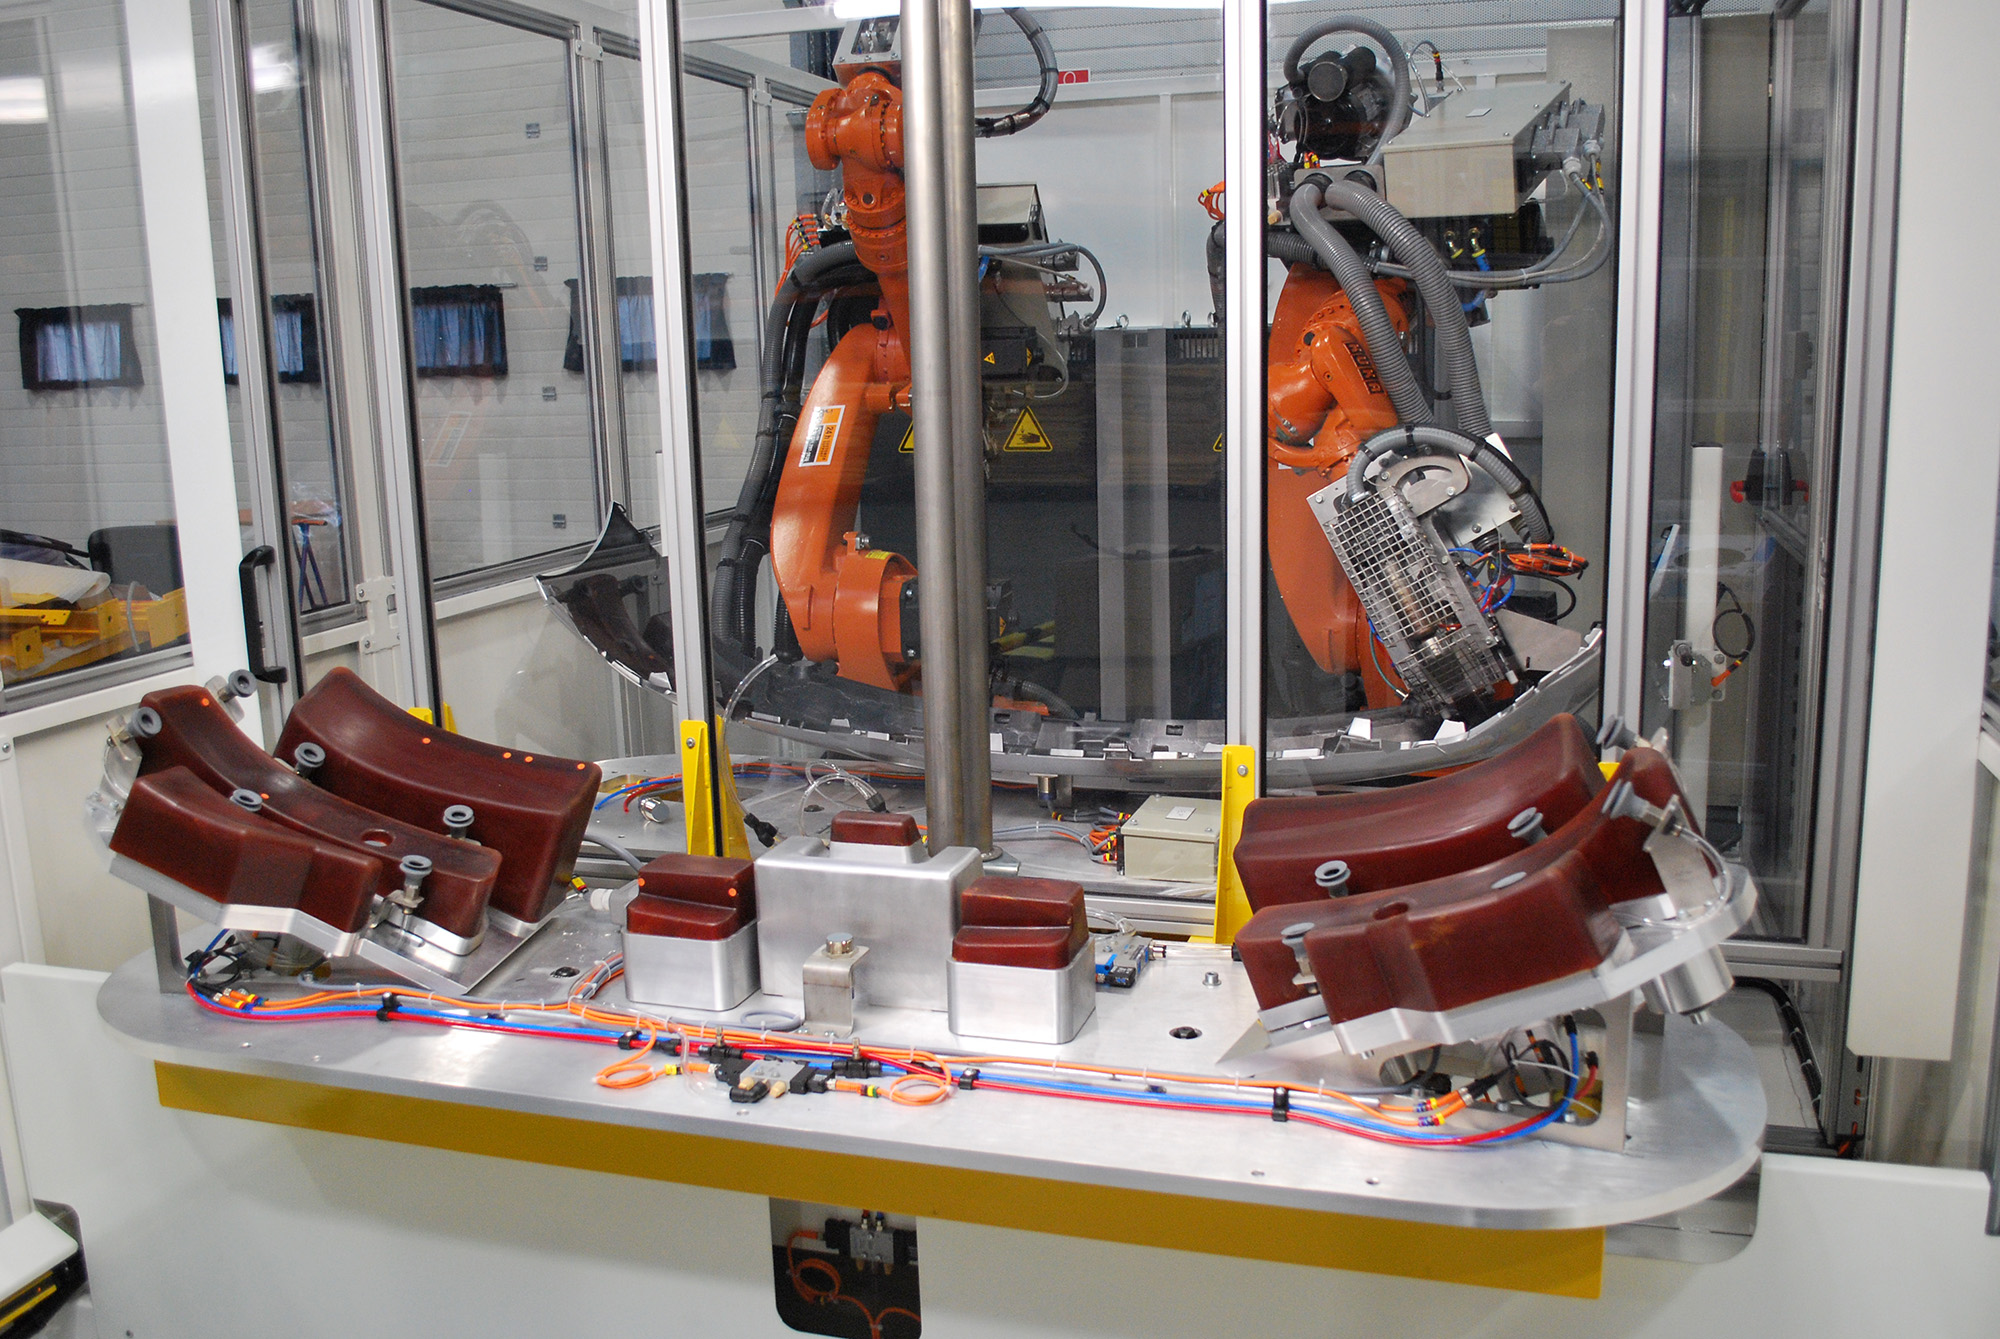 Robotic gluing - Glue robot system - GEBE2